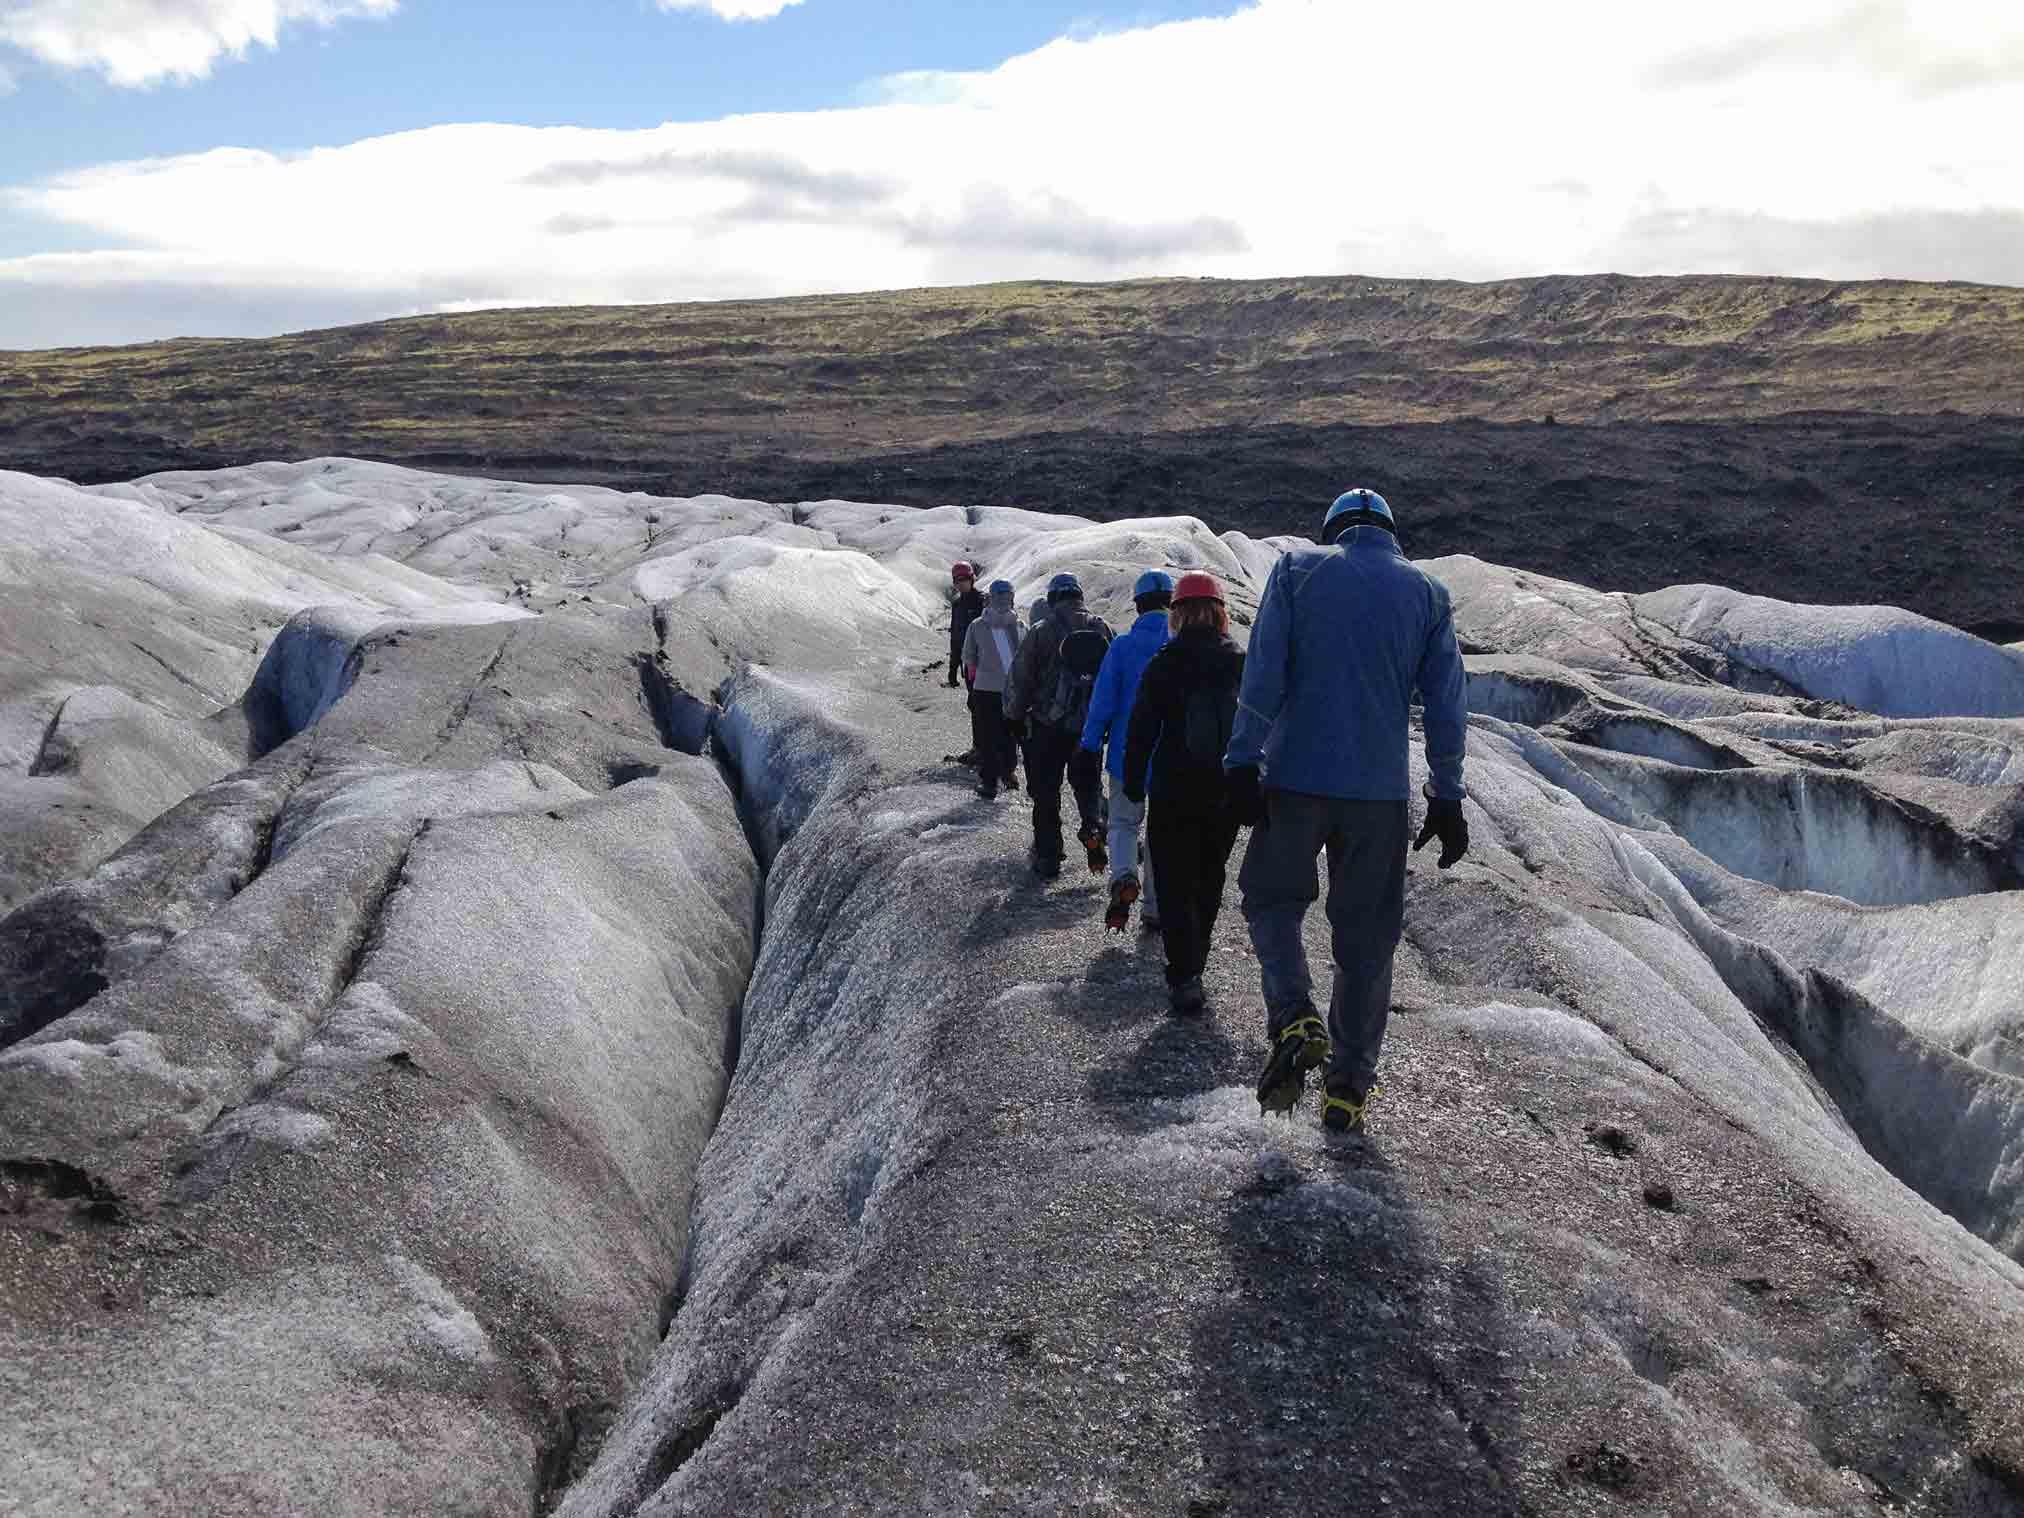 Fernando Reyero Gómez – Fotos del viaje La gran vuelta a Islandia